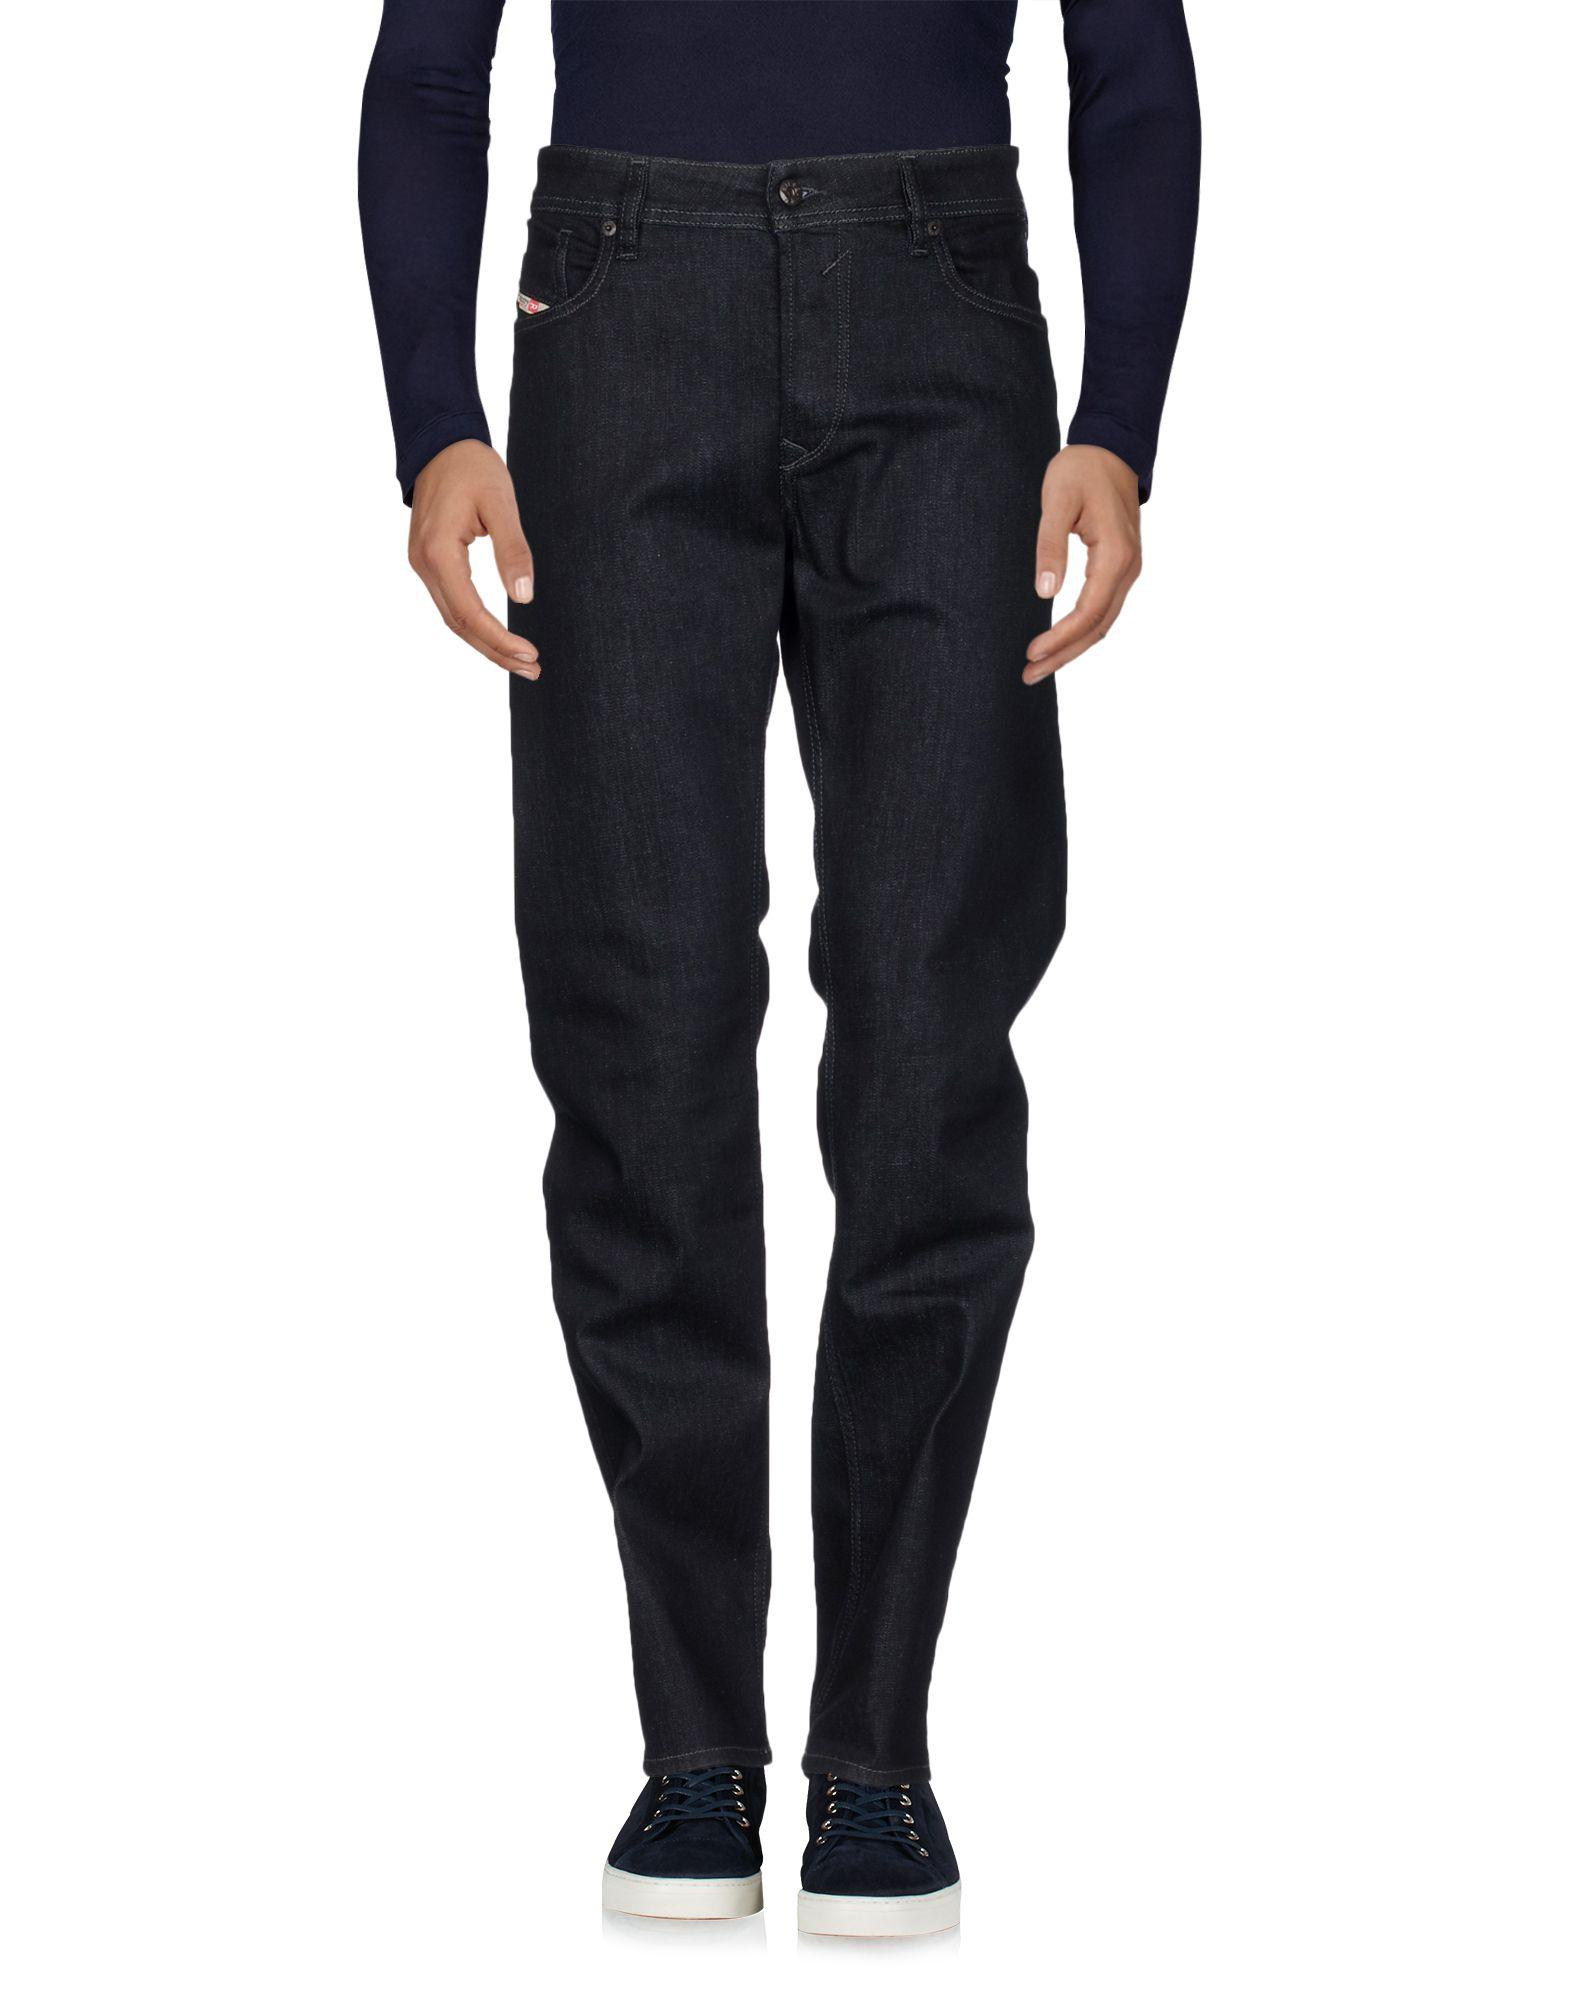 Pantaloni Jeans Diesel Uomo - - - 42682604IT 6d4ce5